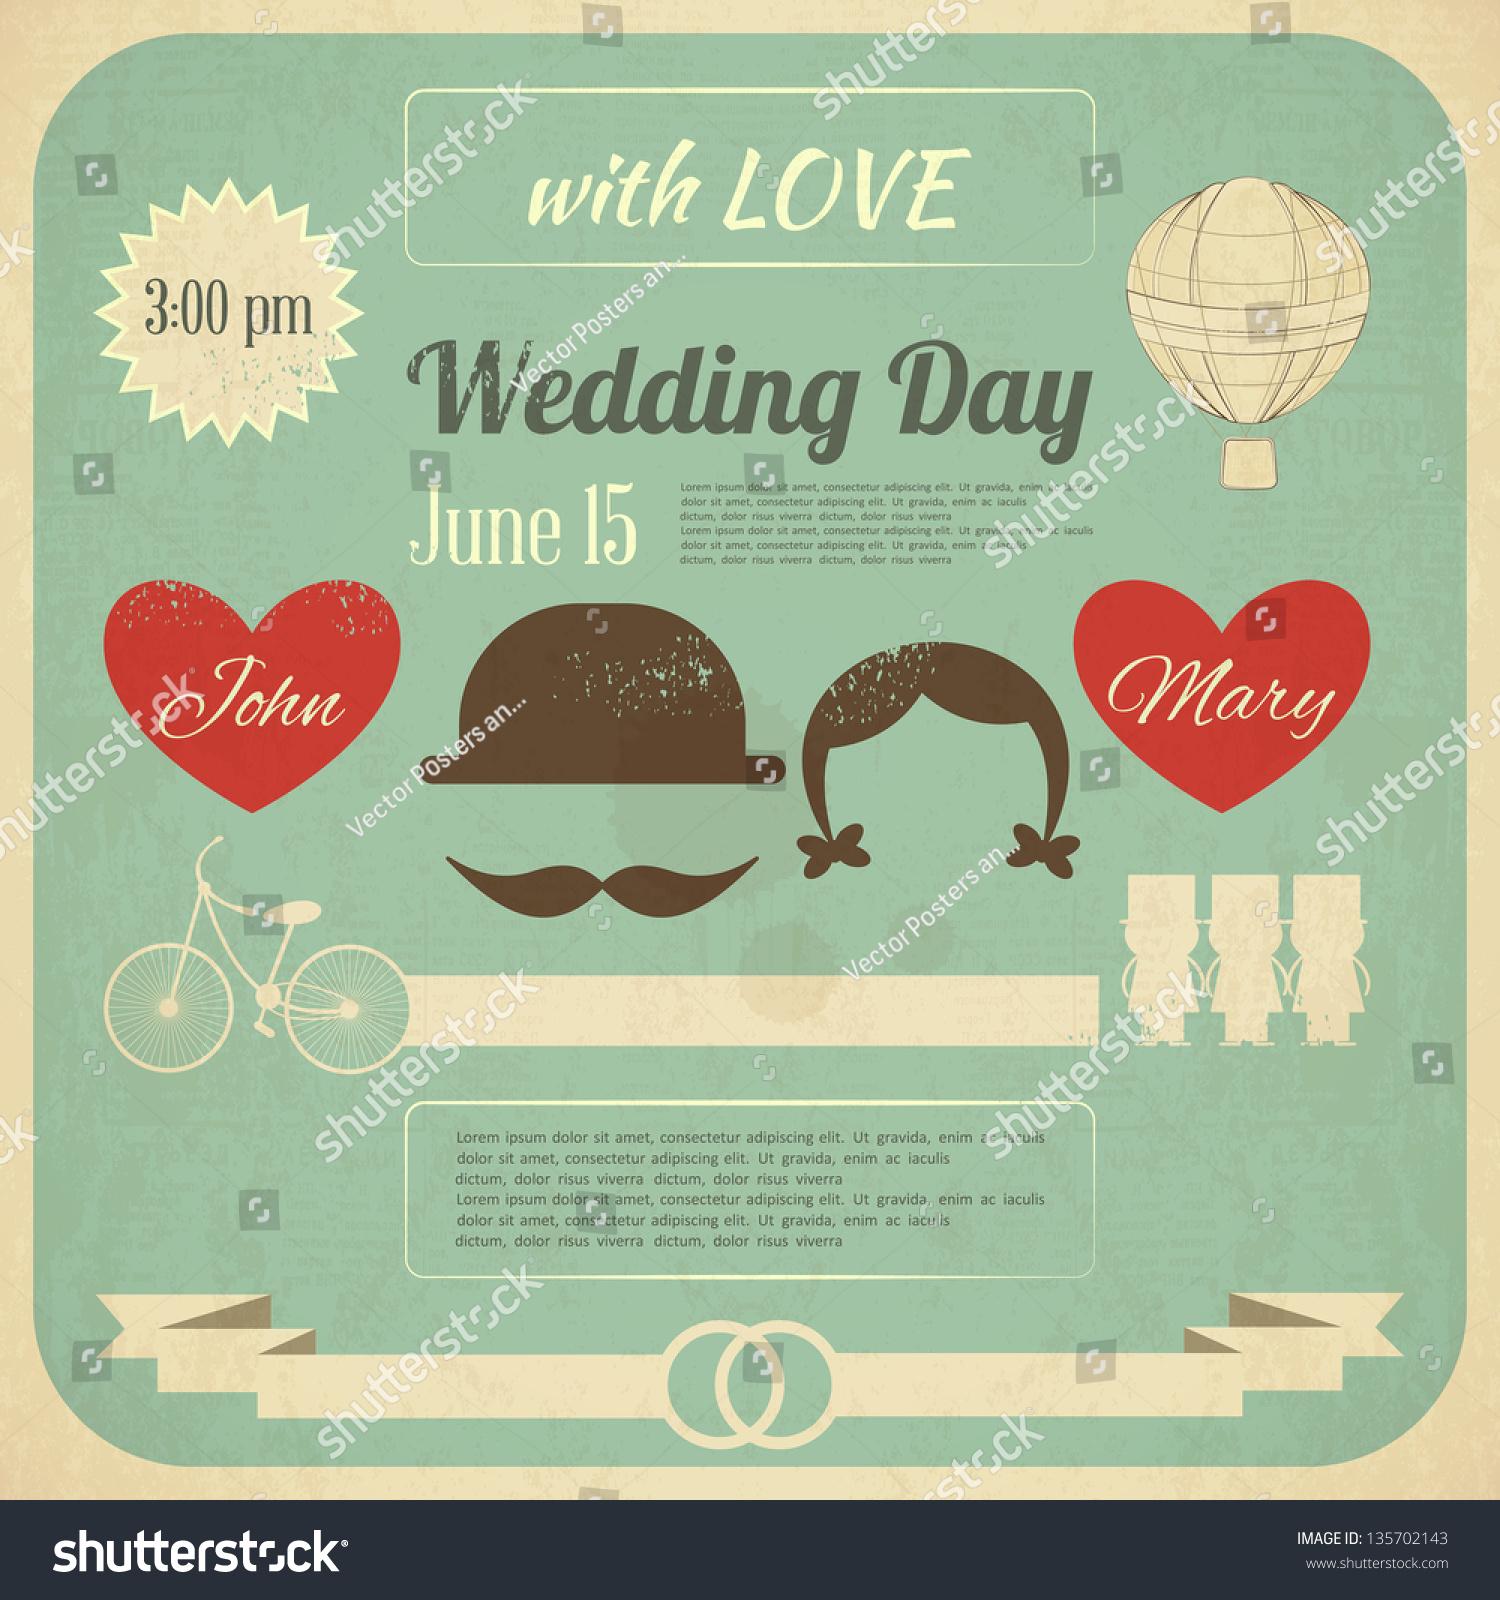 Wedding Invitation In Retro Infographics Style. Vintage